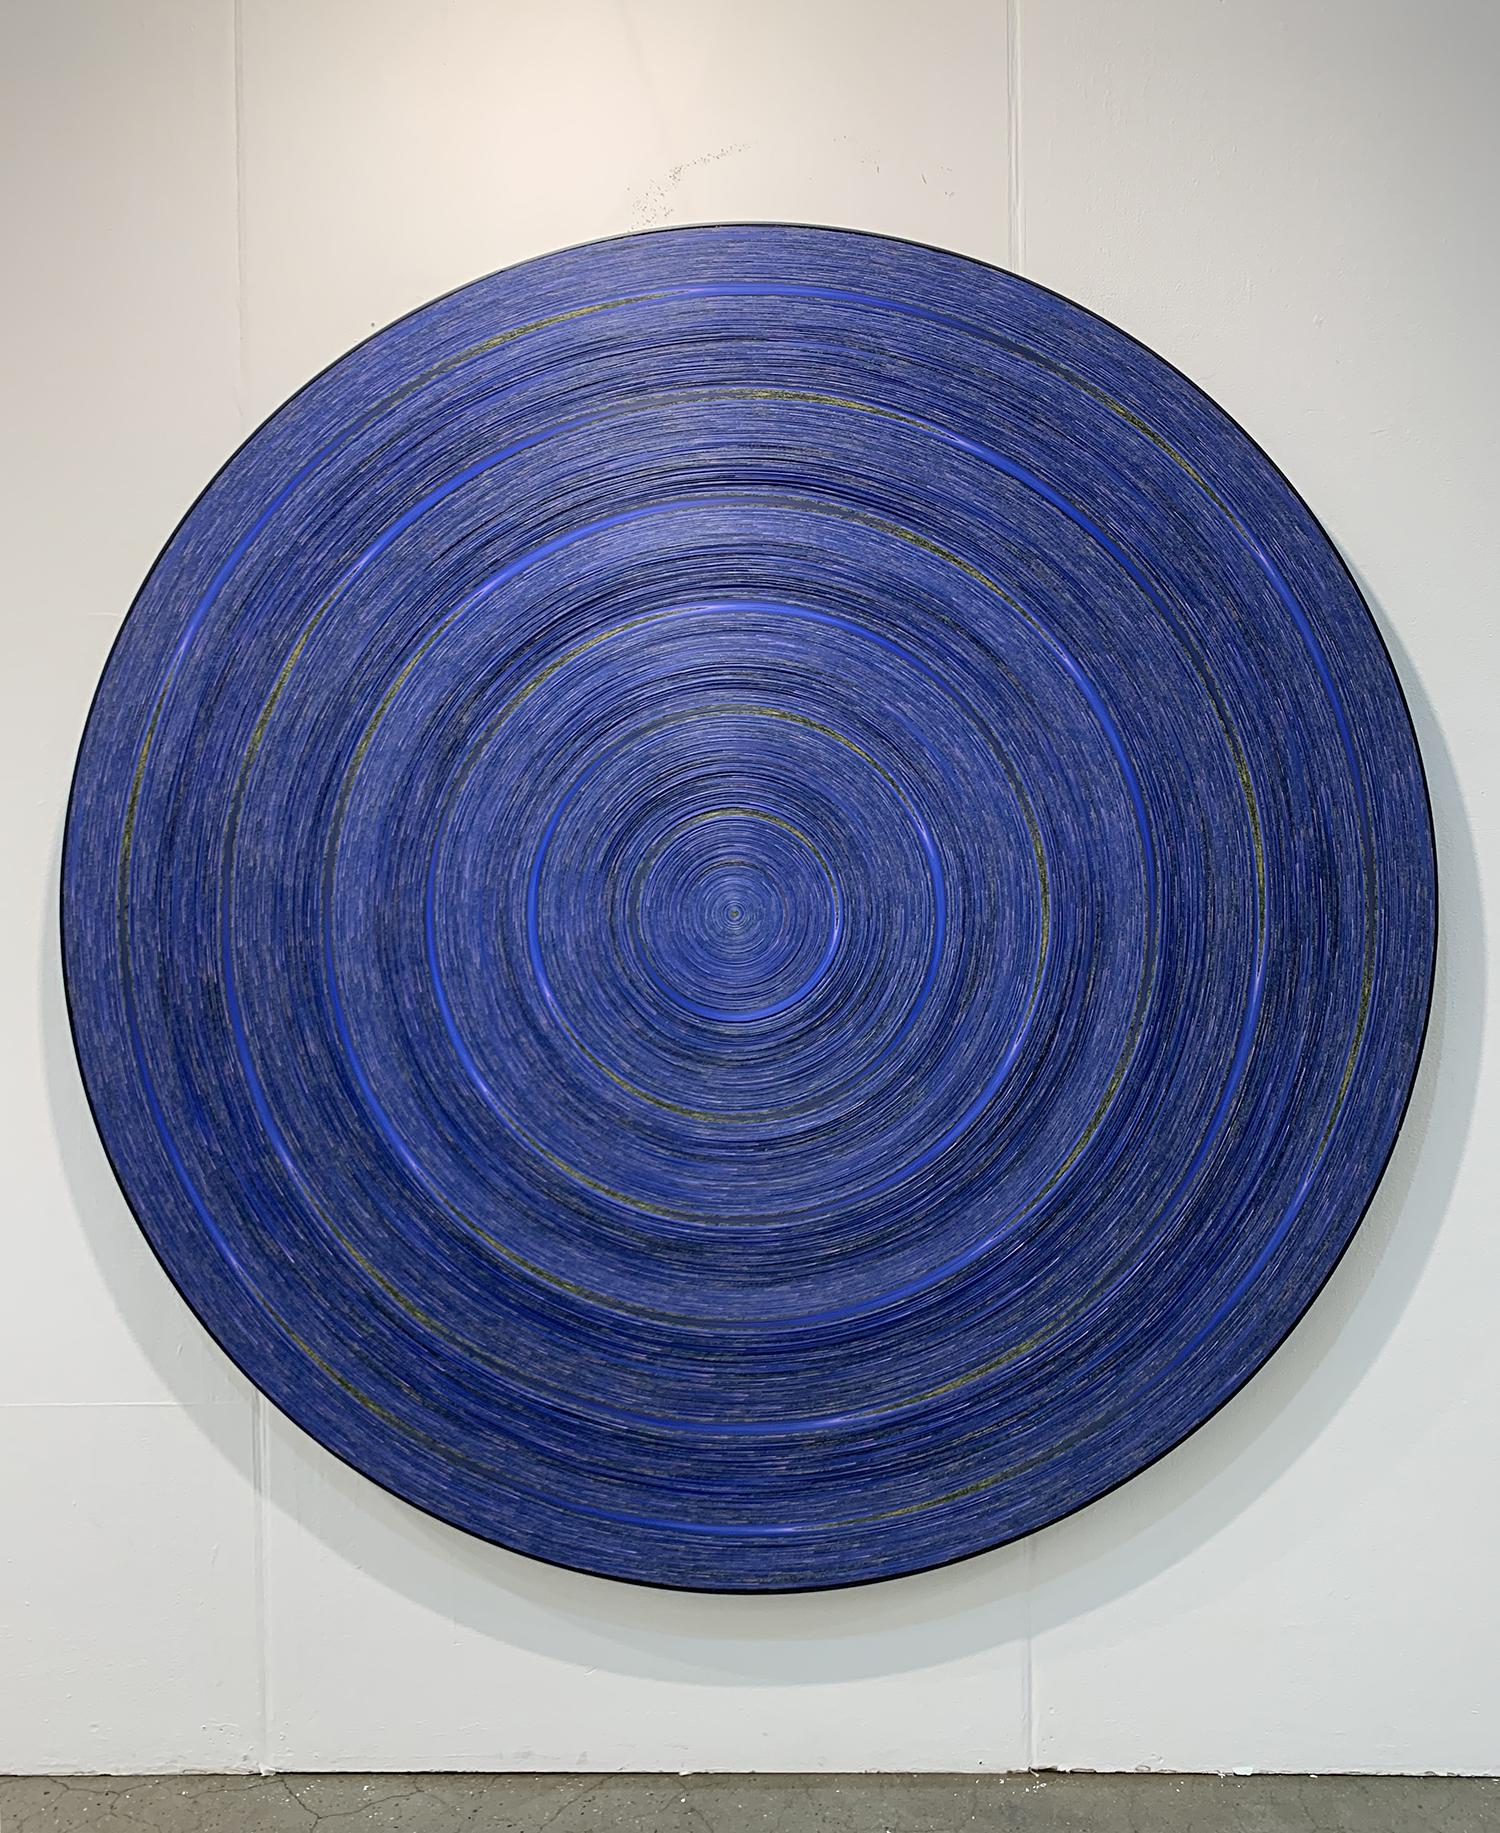 COSMOS_BLUE_1_exhibit.jpg